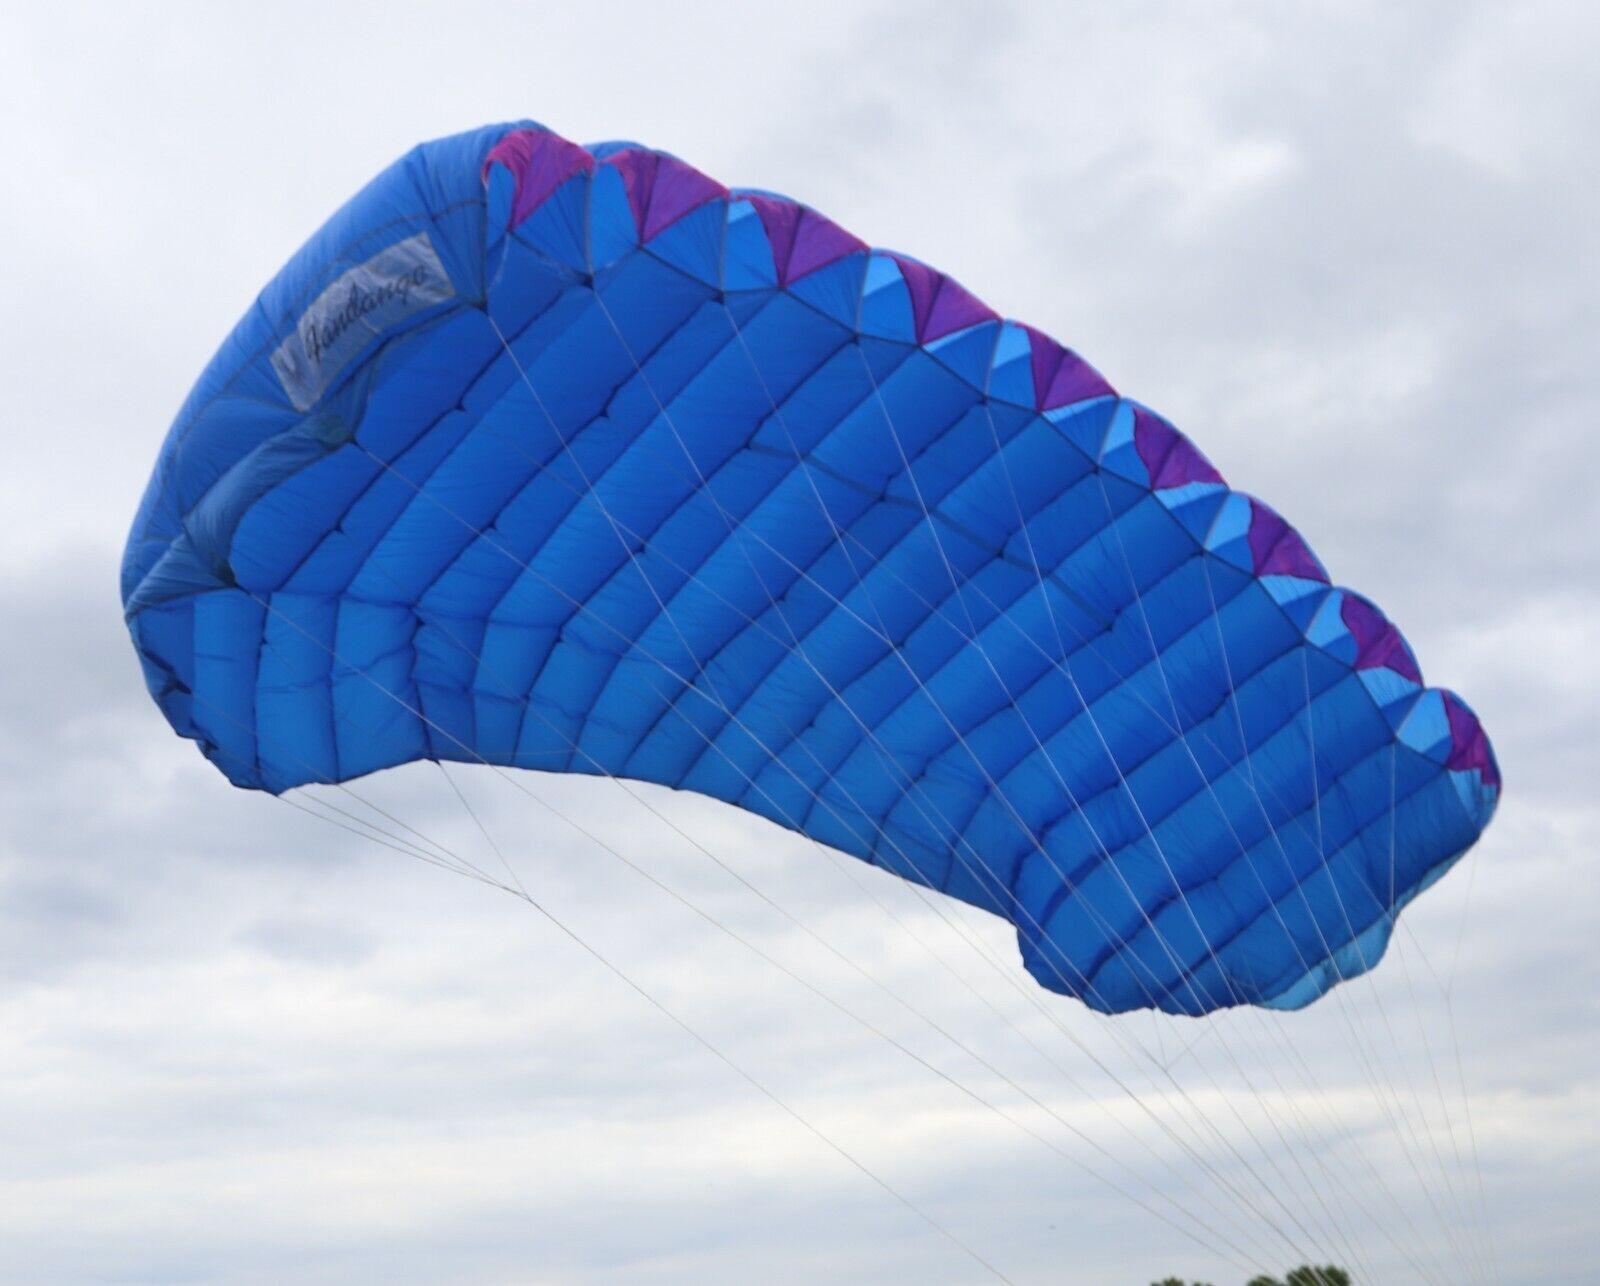 Feango 912 129 sqft  9 cell ZP cielodiving parachute canopy